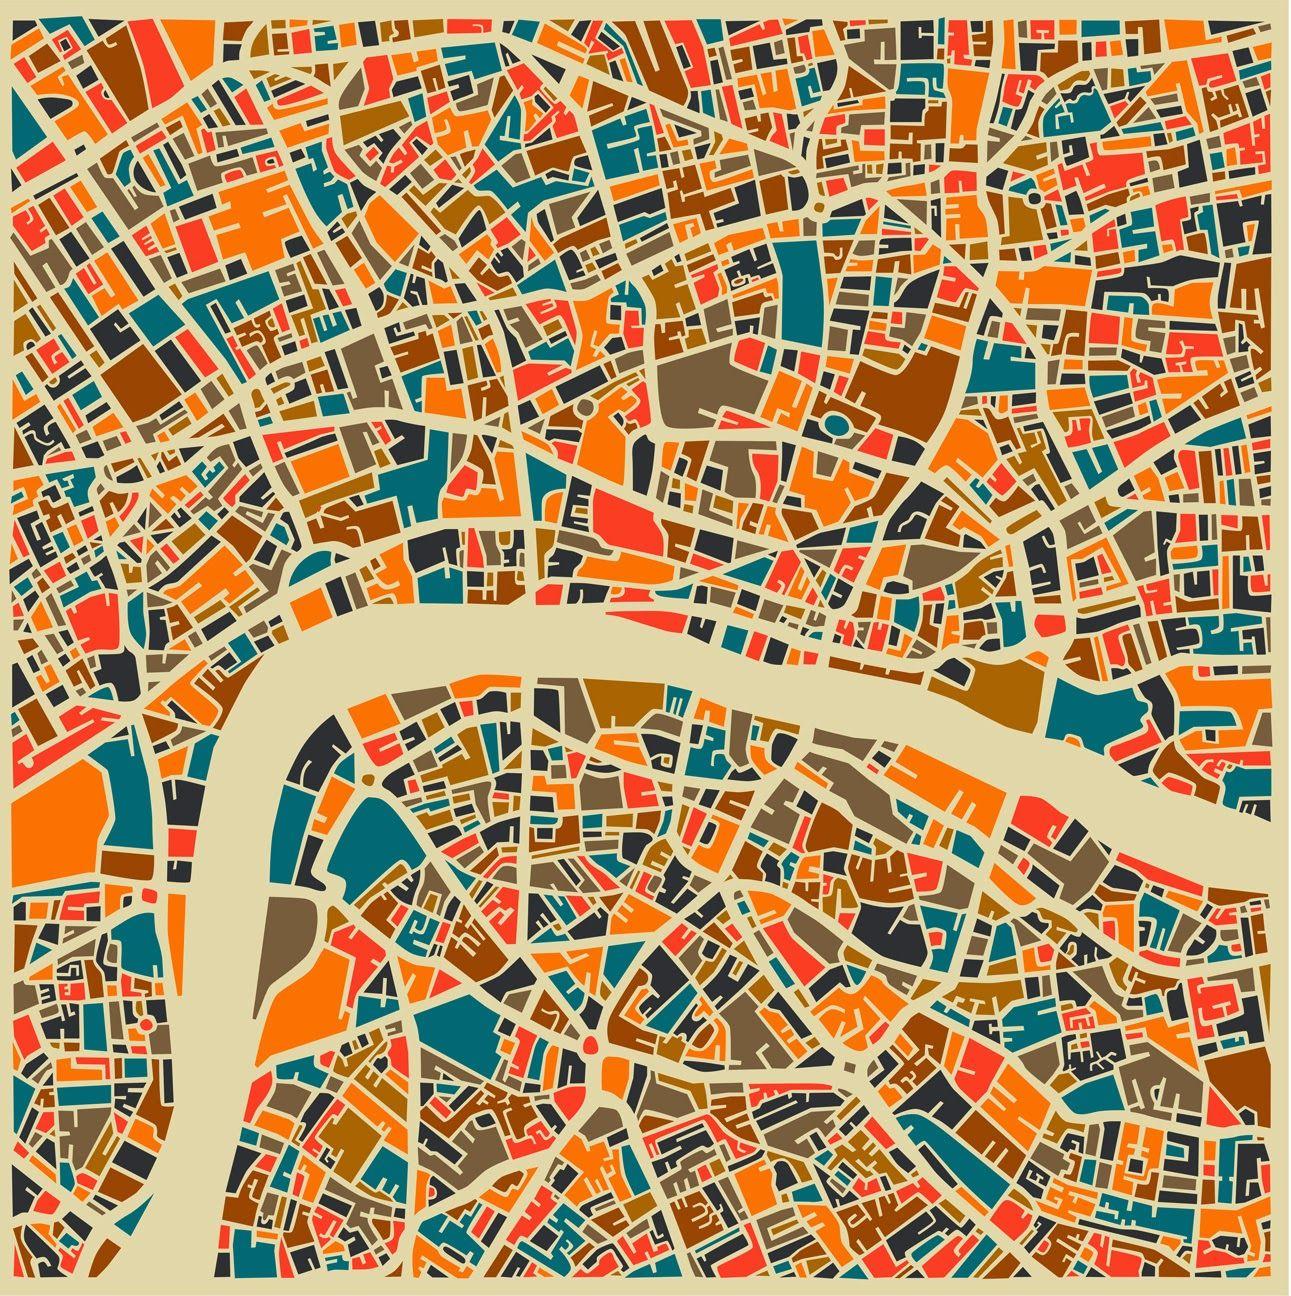 jazzberry blues city maps london